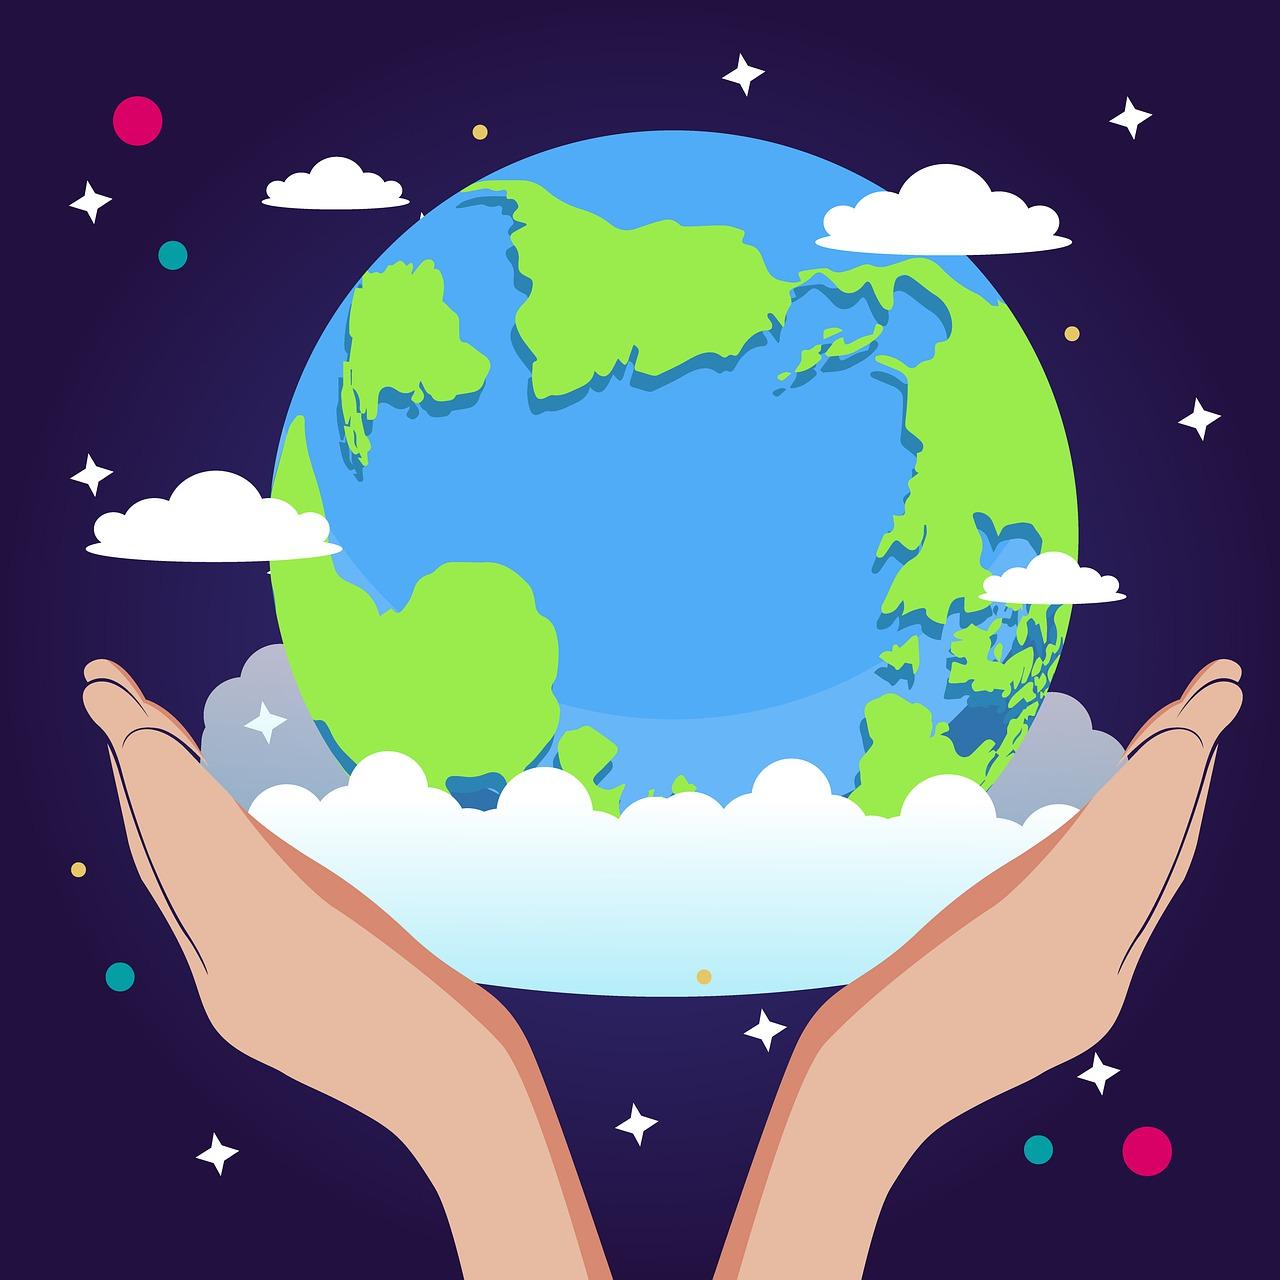 Earth Hour Save Protect - Free image on Pixabay